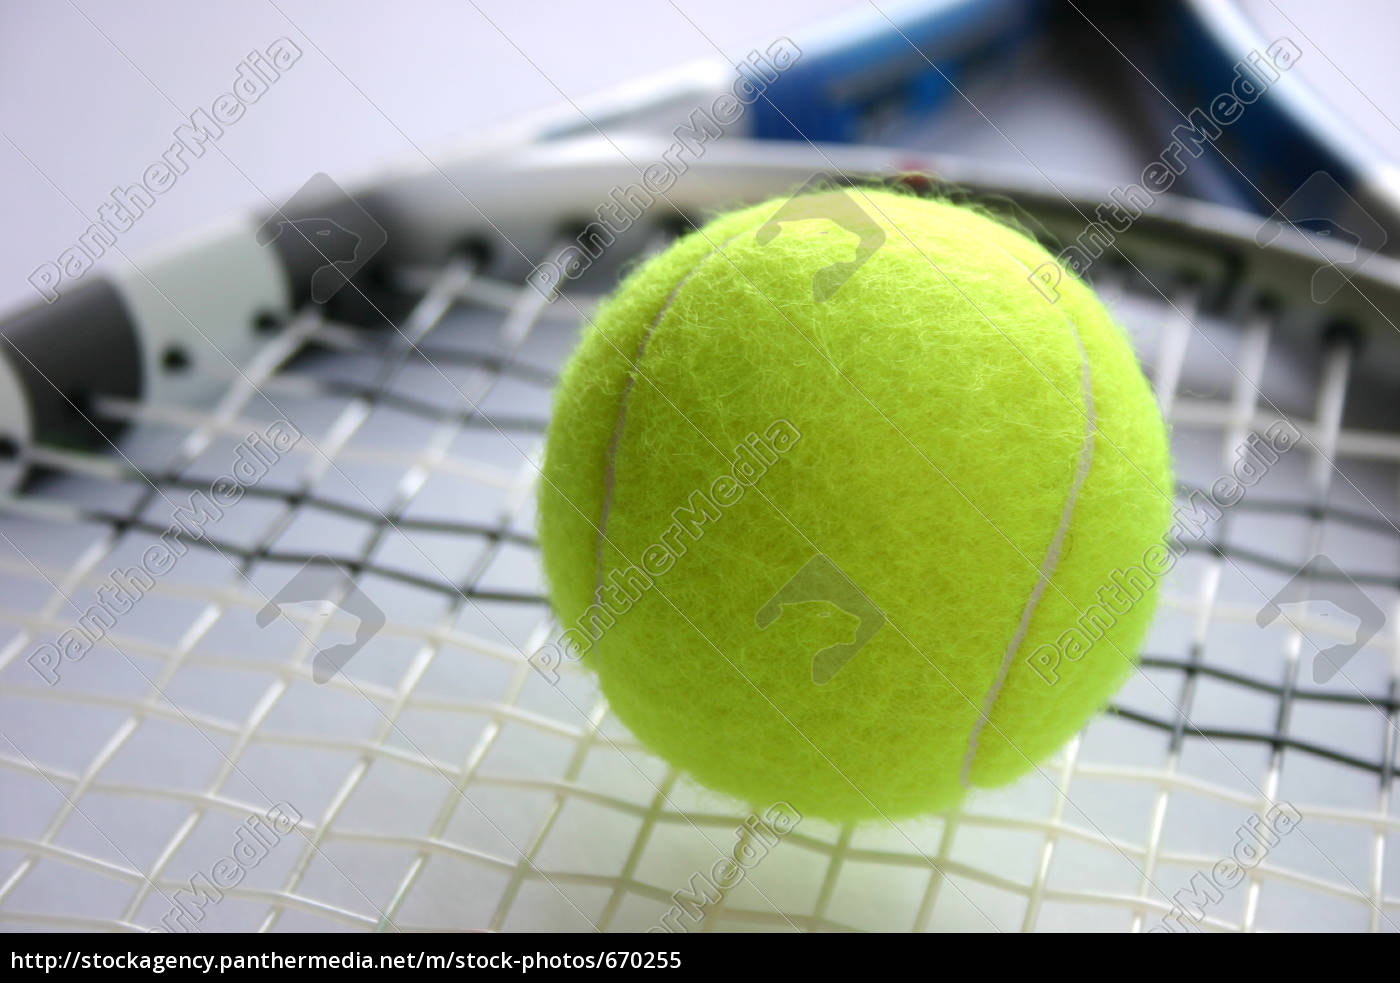 recreational, sports - 670255